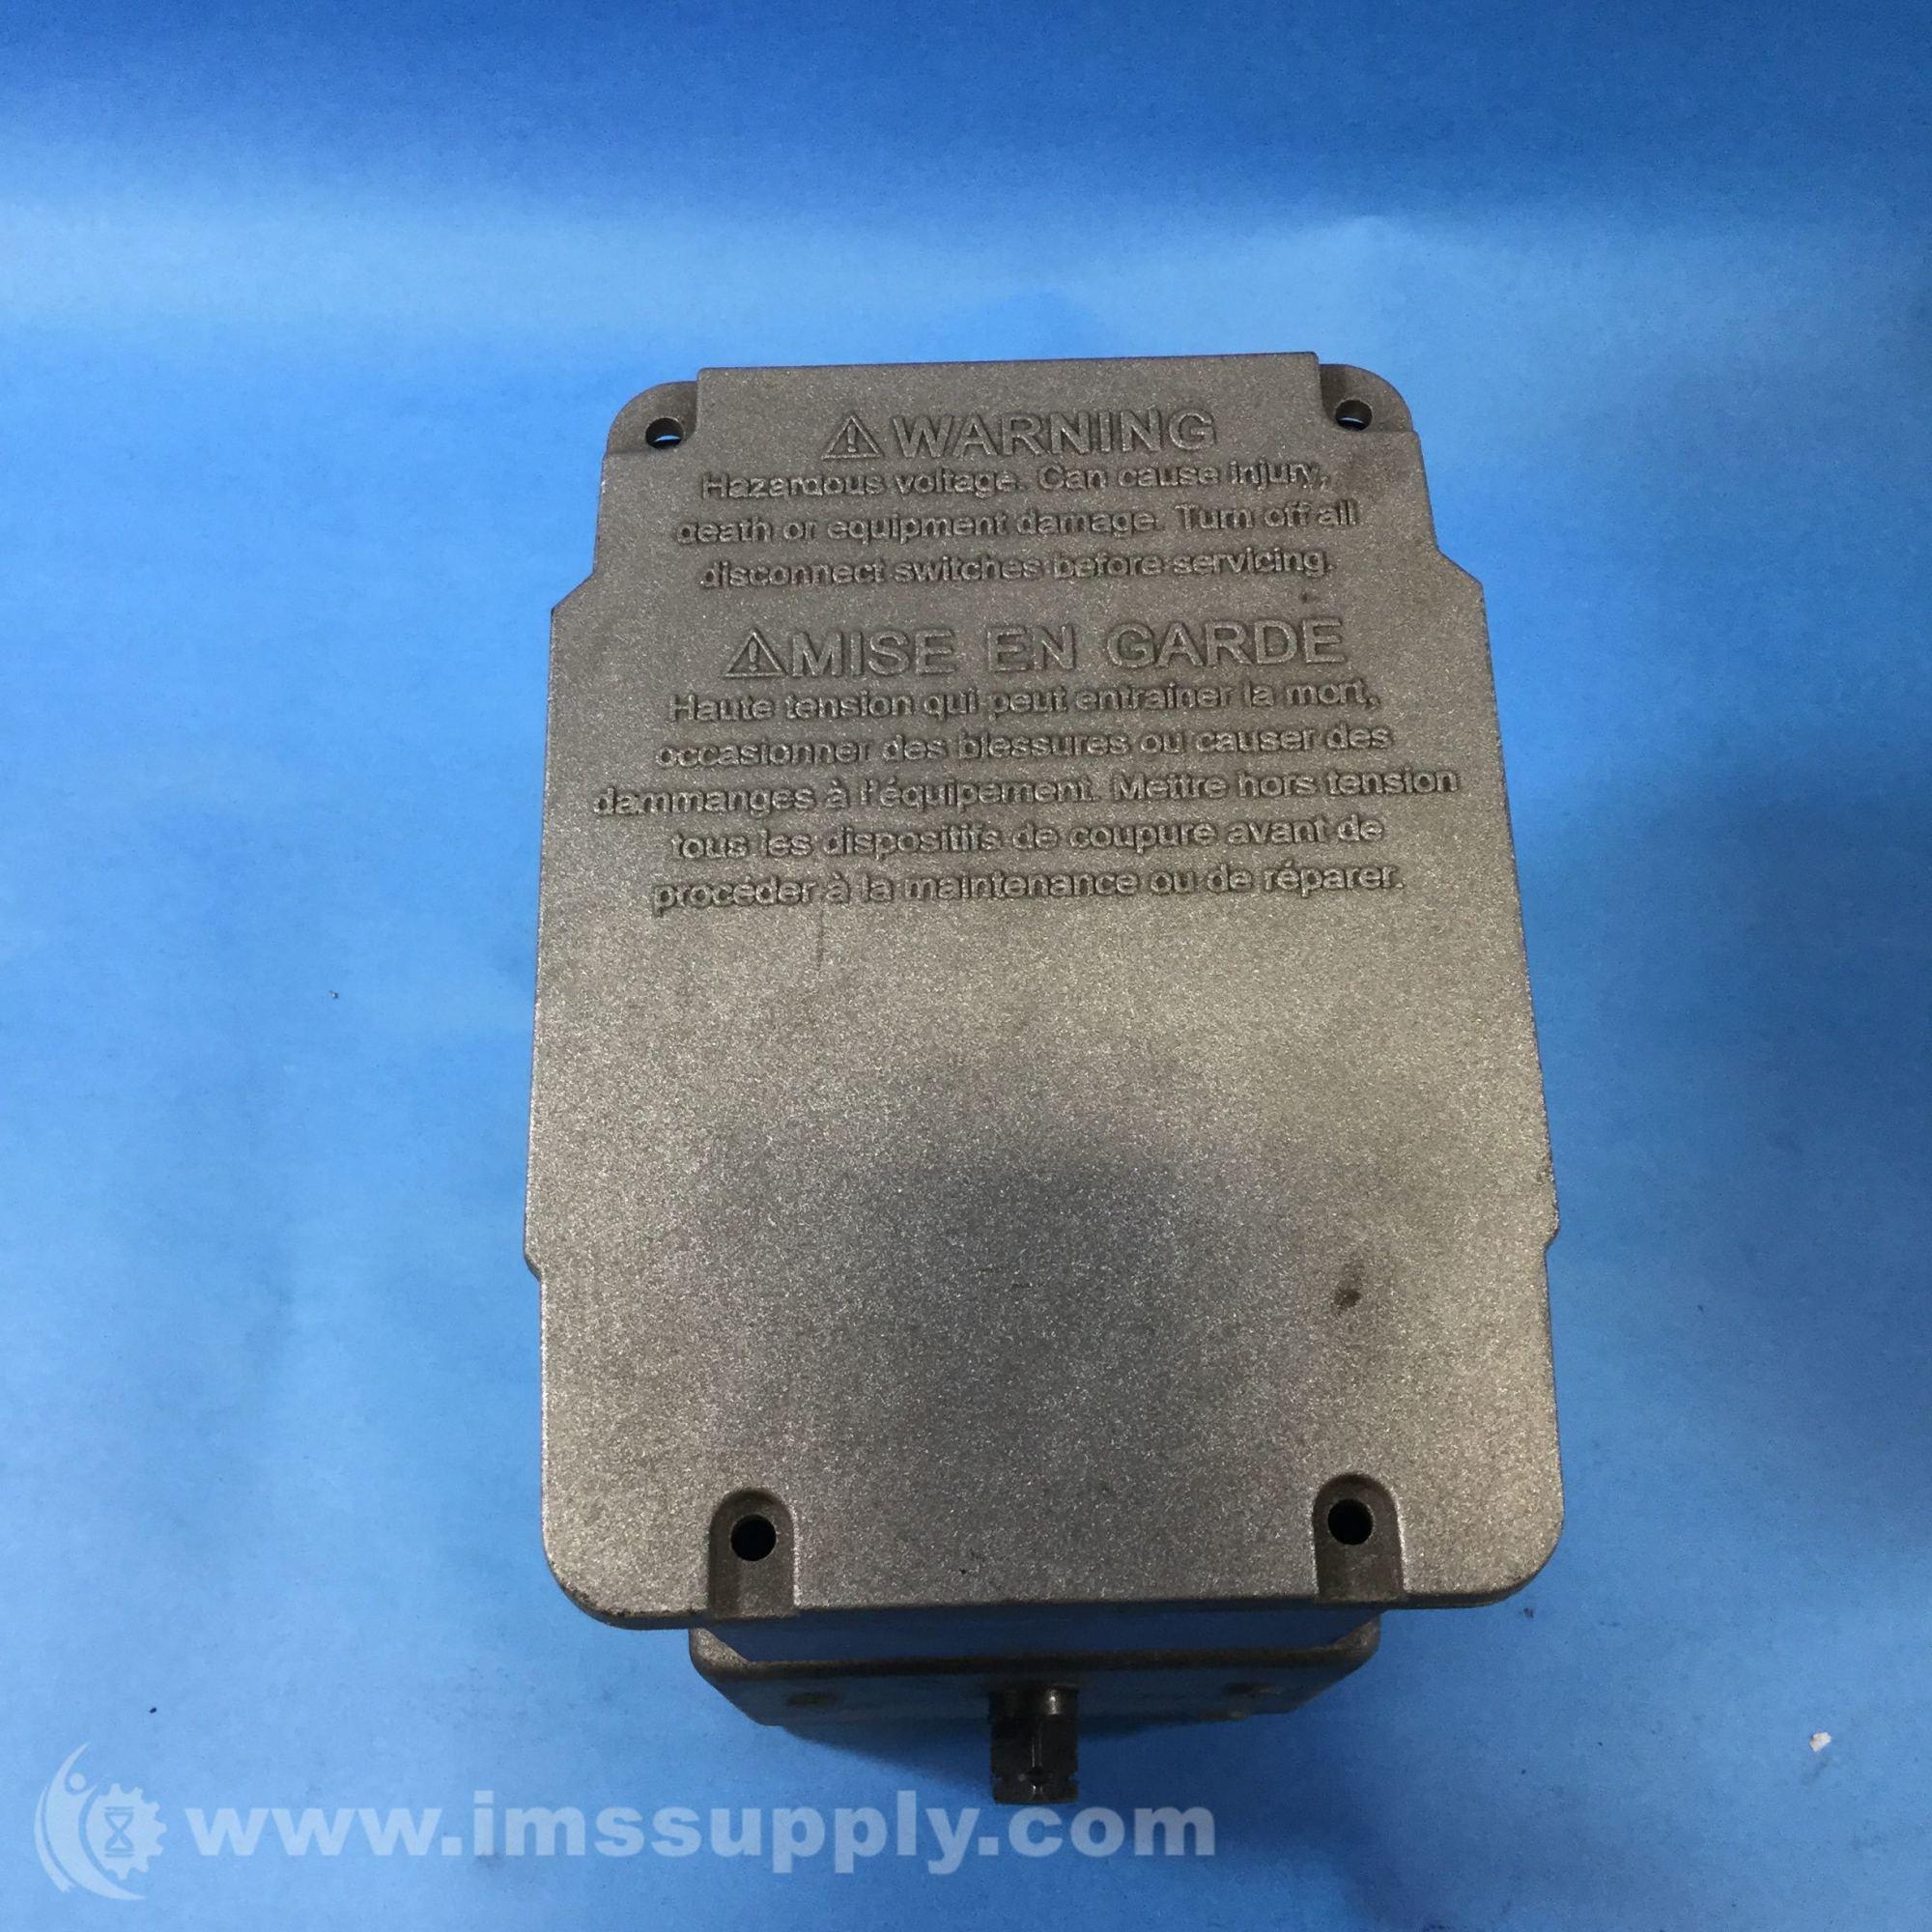 hight resolution of  motor honeywell m7284c1000 actuator wiring diagram bettis actuator on coil schematic diagram bettis valve